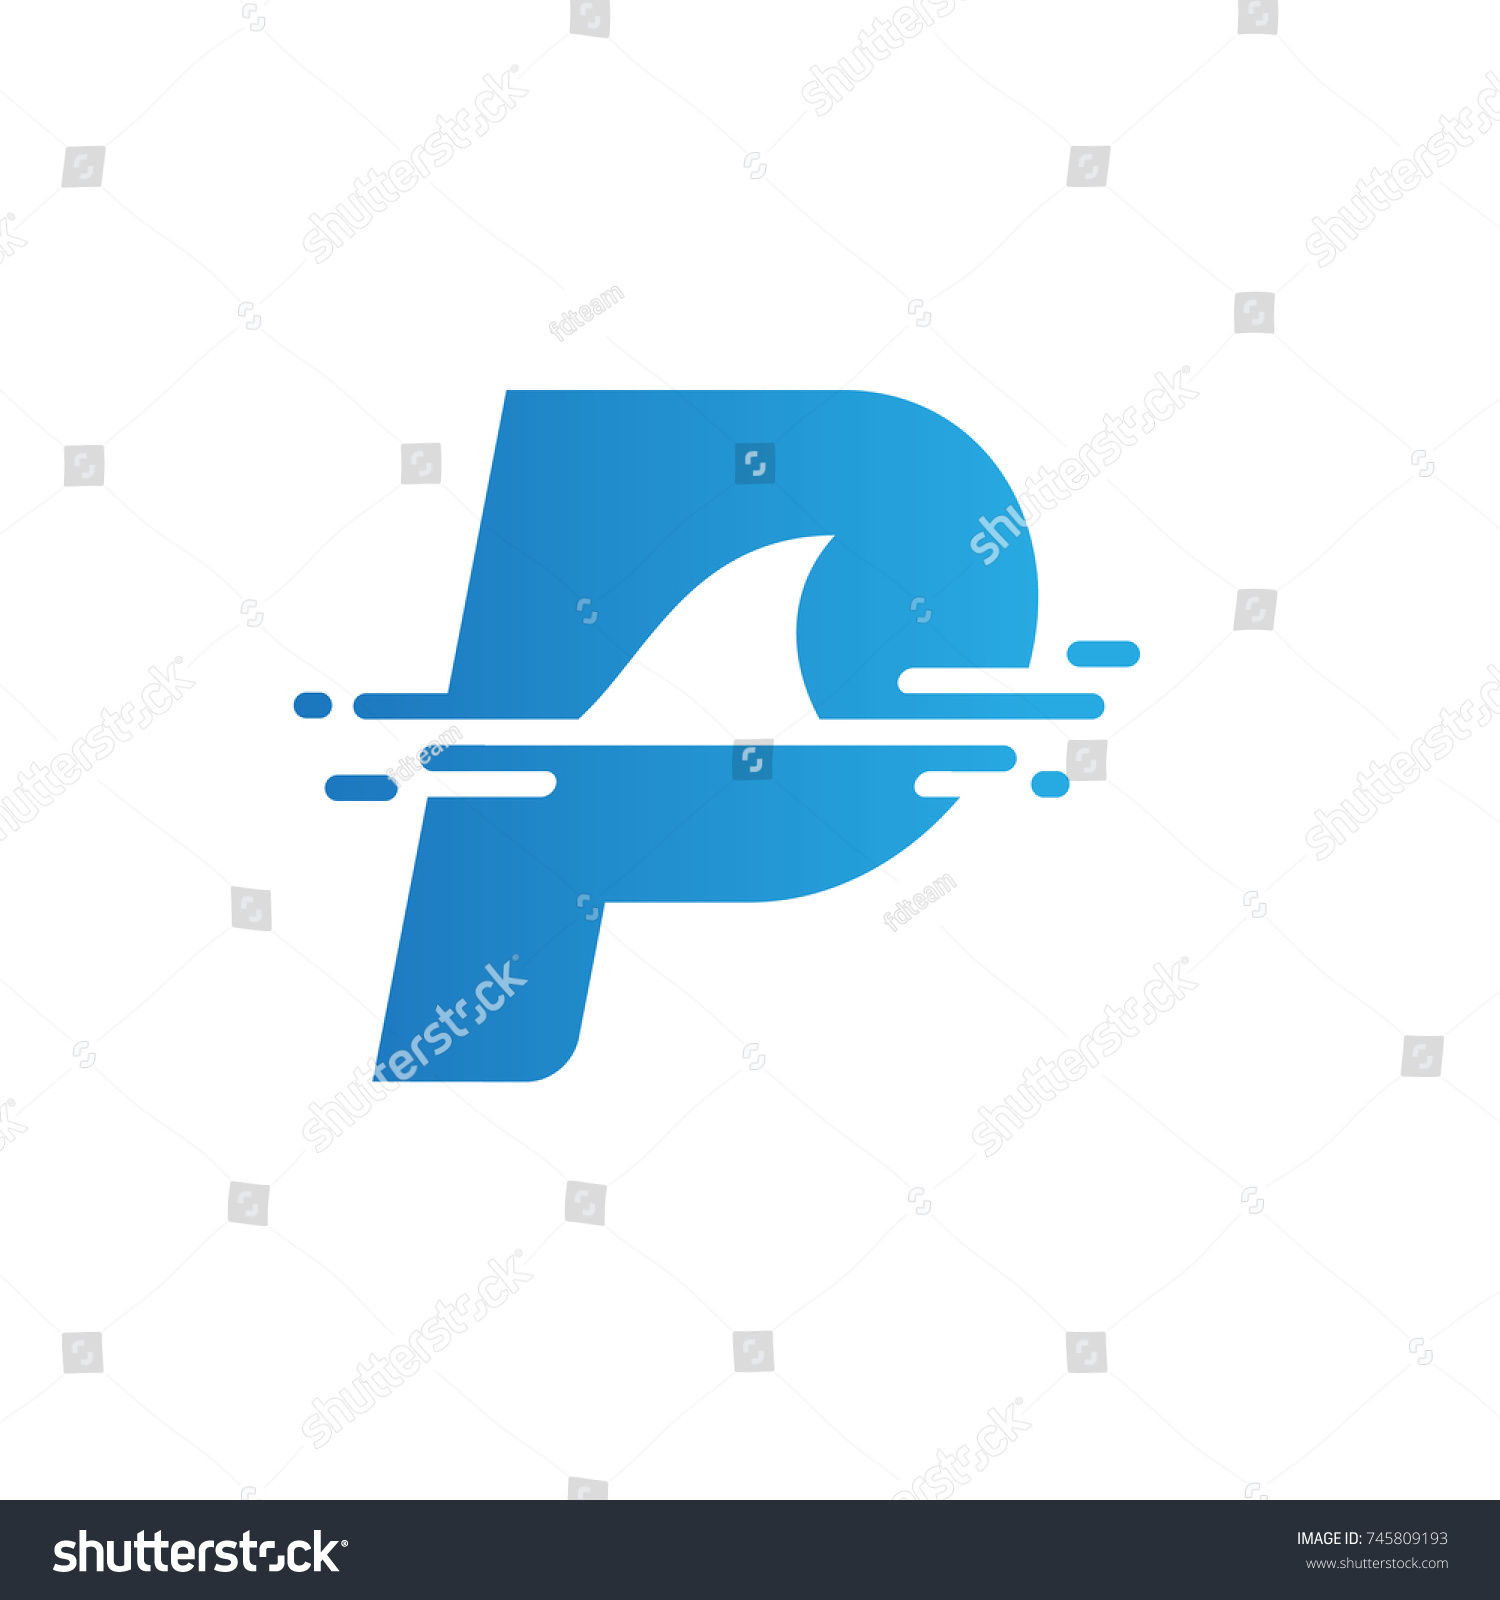 Letter p shark symbol illustration logo stock vector 745809193 letter p shark symbol illustration logo and icon element template biocorpaavc